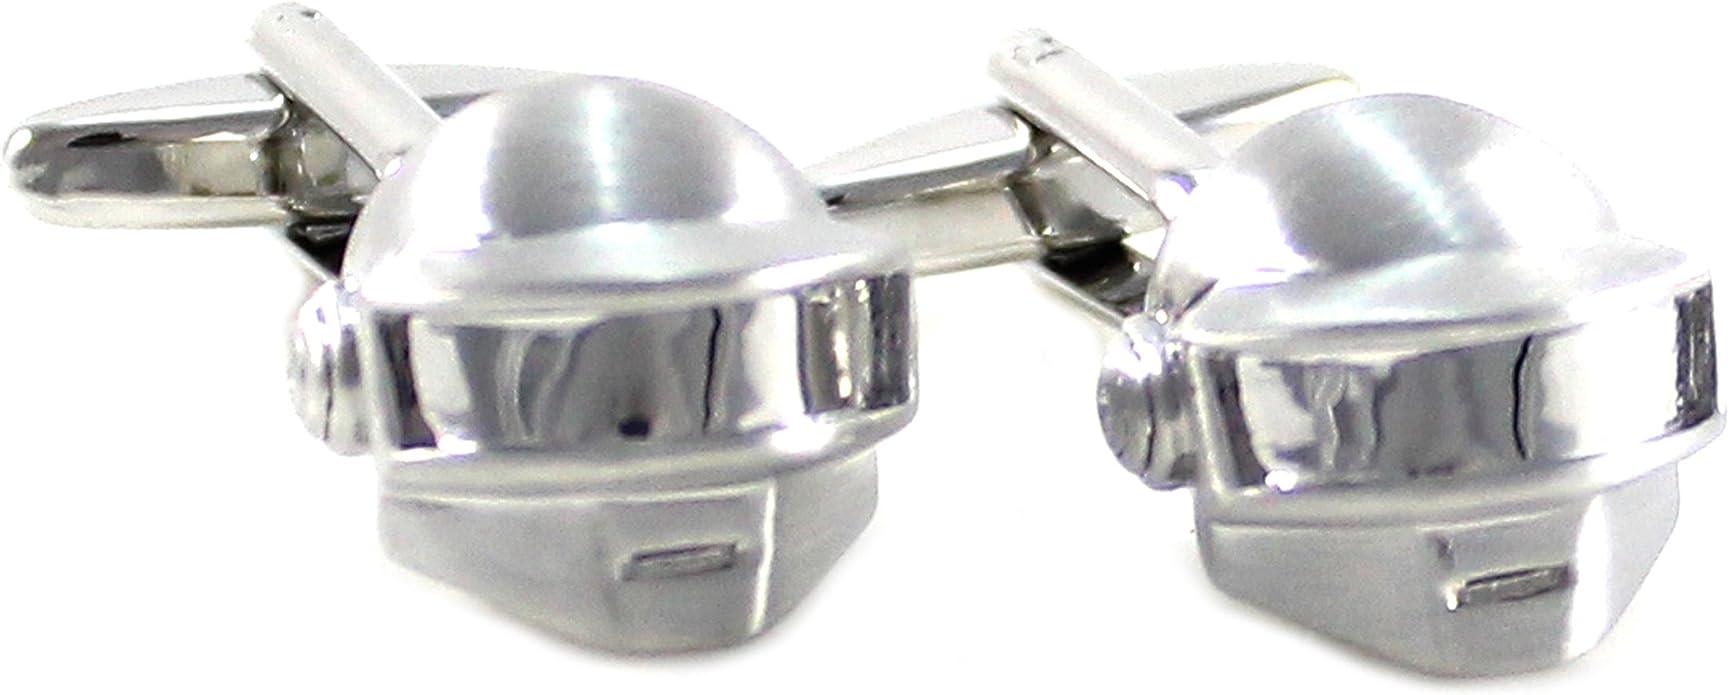 mendepot Novelty Daft Punk Casco Gemelos con caja cepillado plata tono casco Gemelos en caja: Amazon.es: Joyería